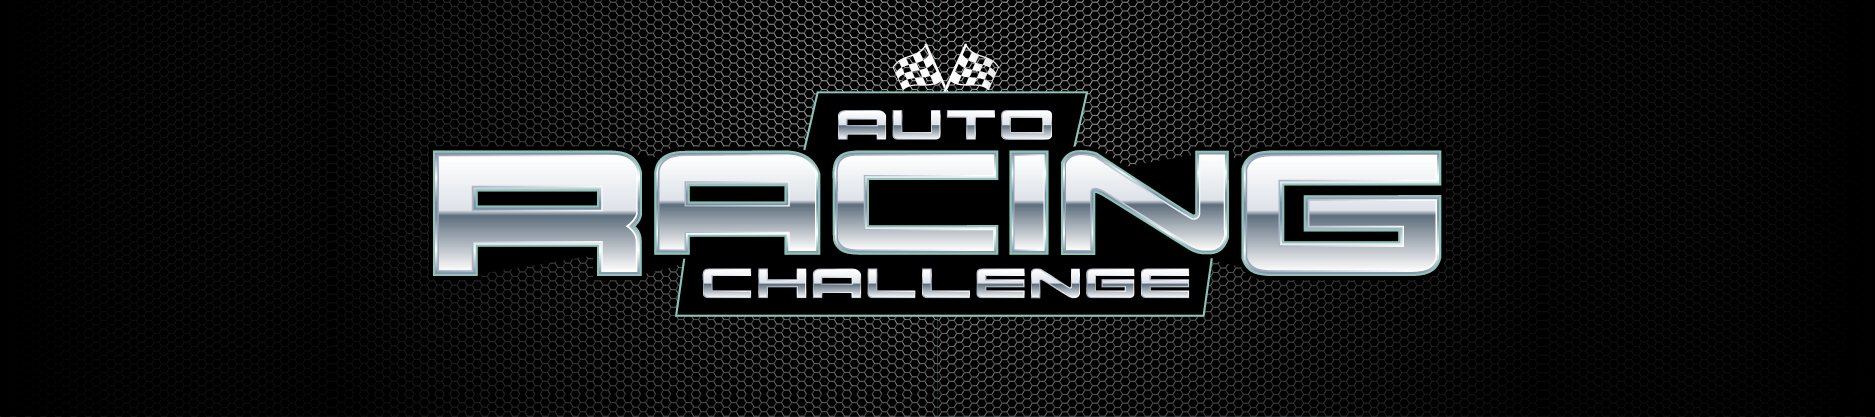 Auto racing challenge_1535556120071.jpg.jpg